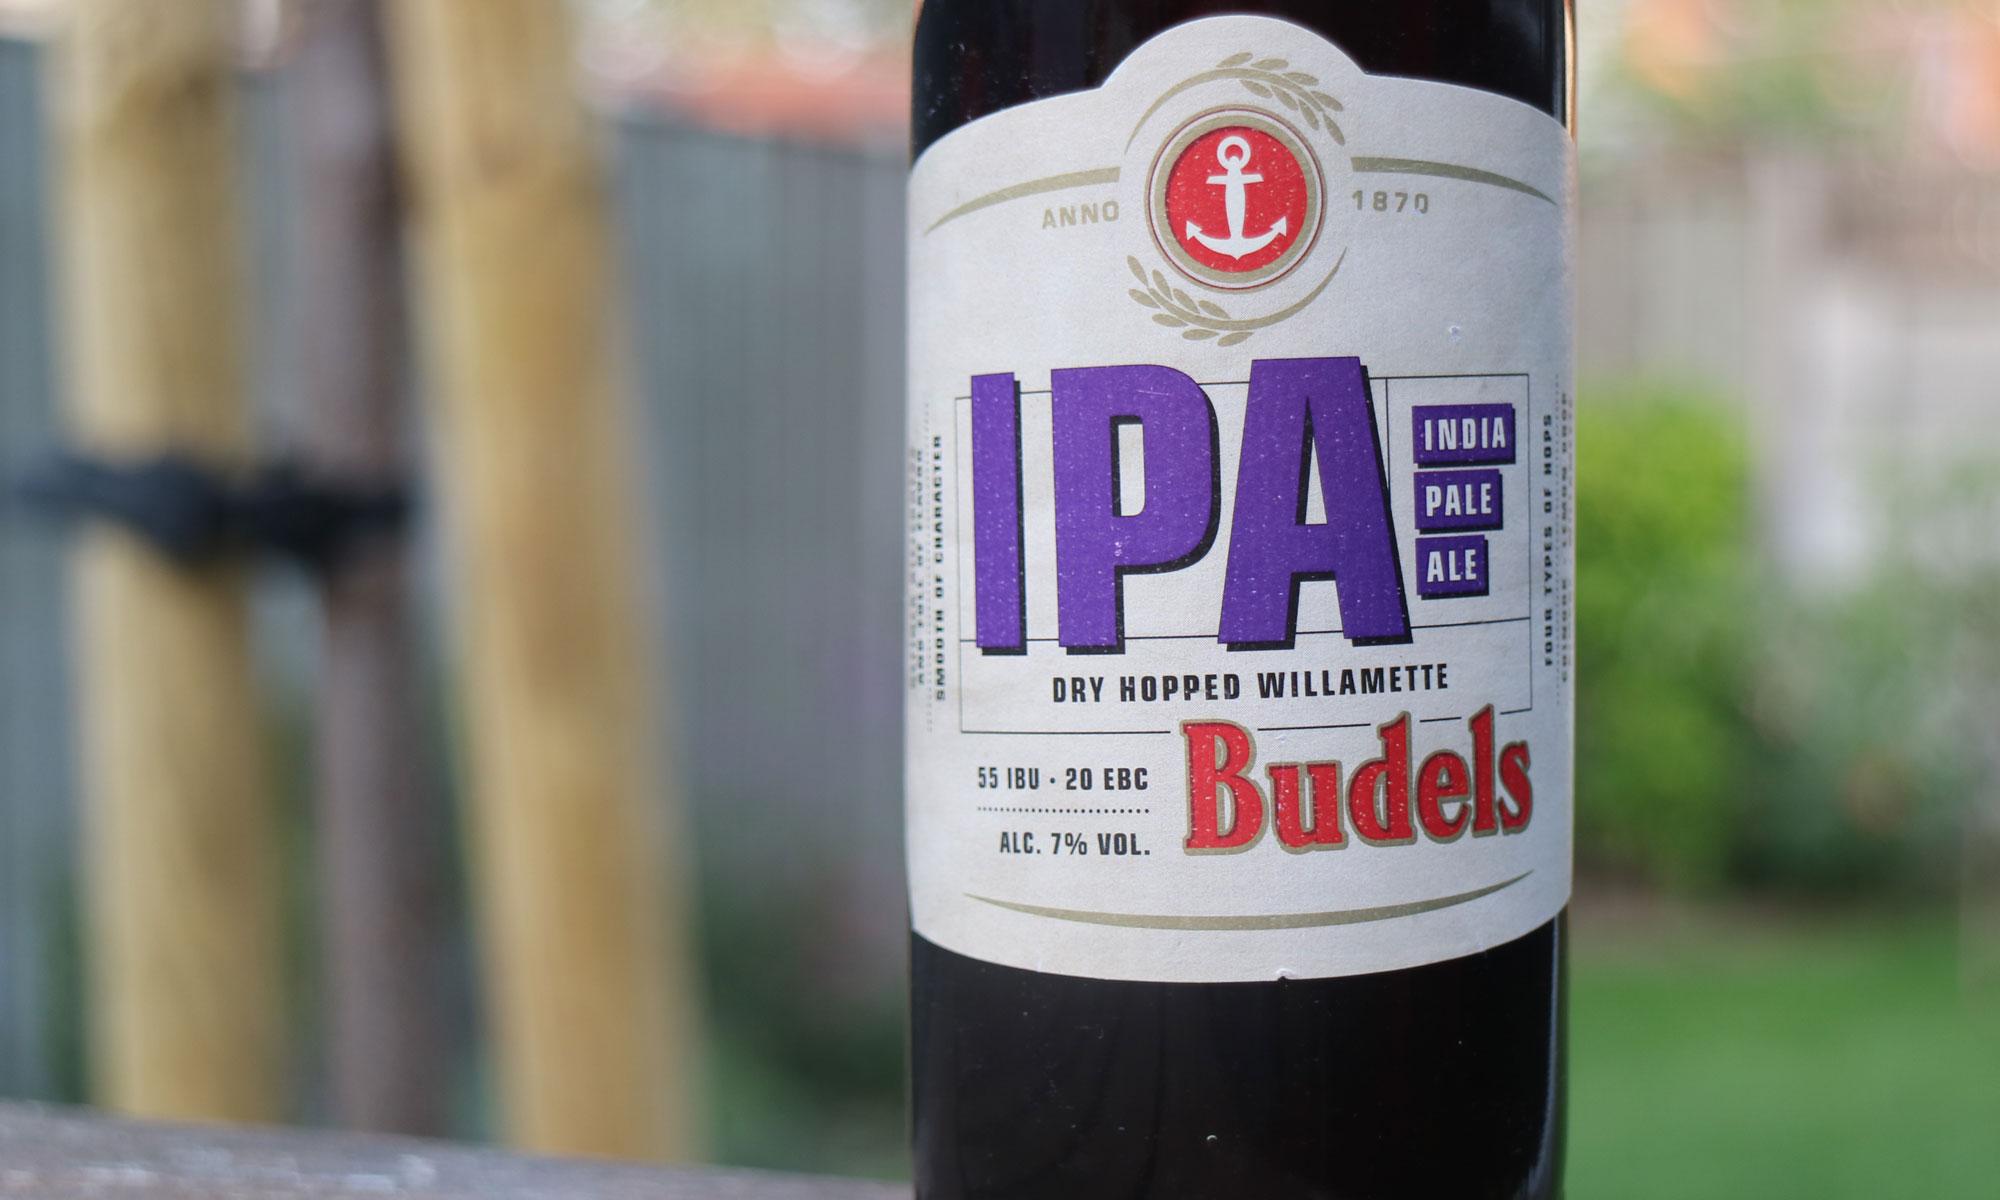 Budelse Brouwerij - Budels IPA